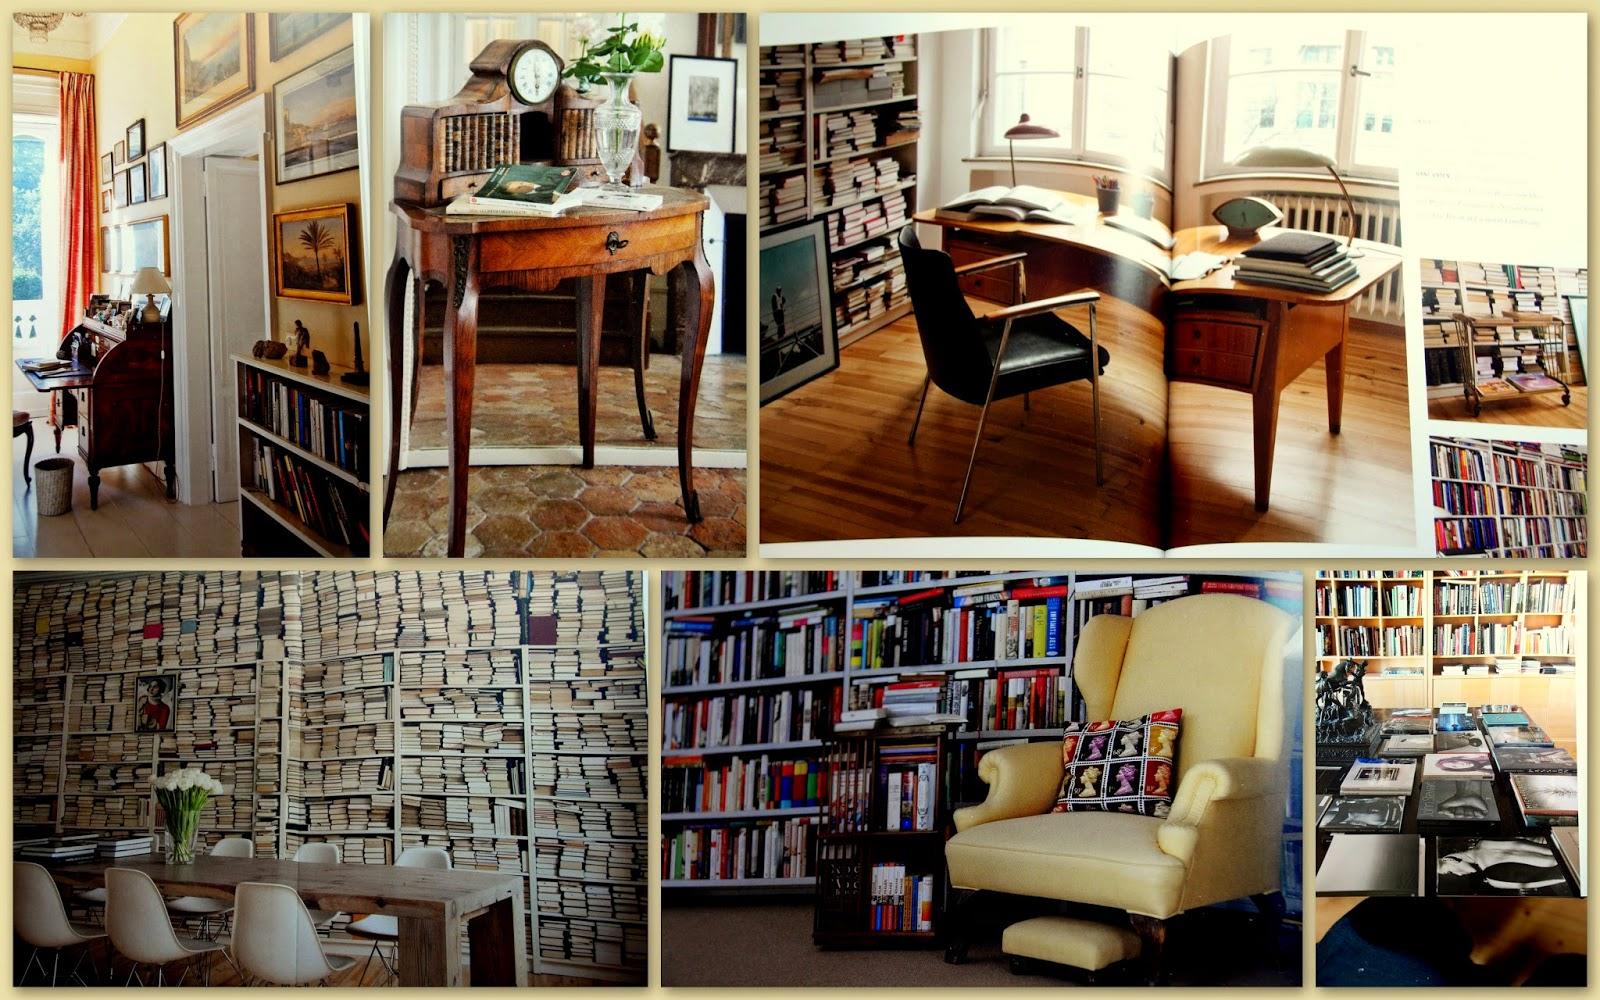 vom gl ck mit b chern zu leben burgdame. Black Bedroom Furniture Sets. Home Design Ideas